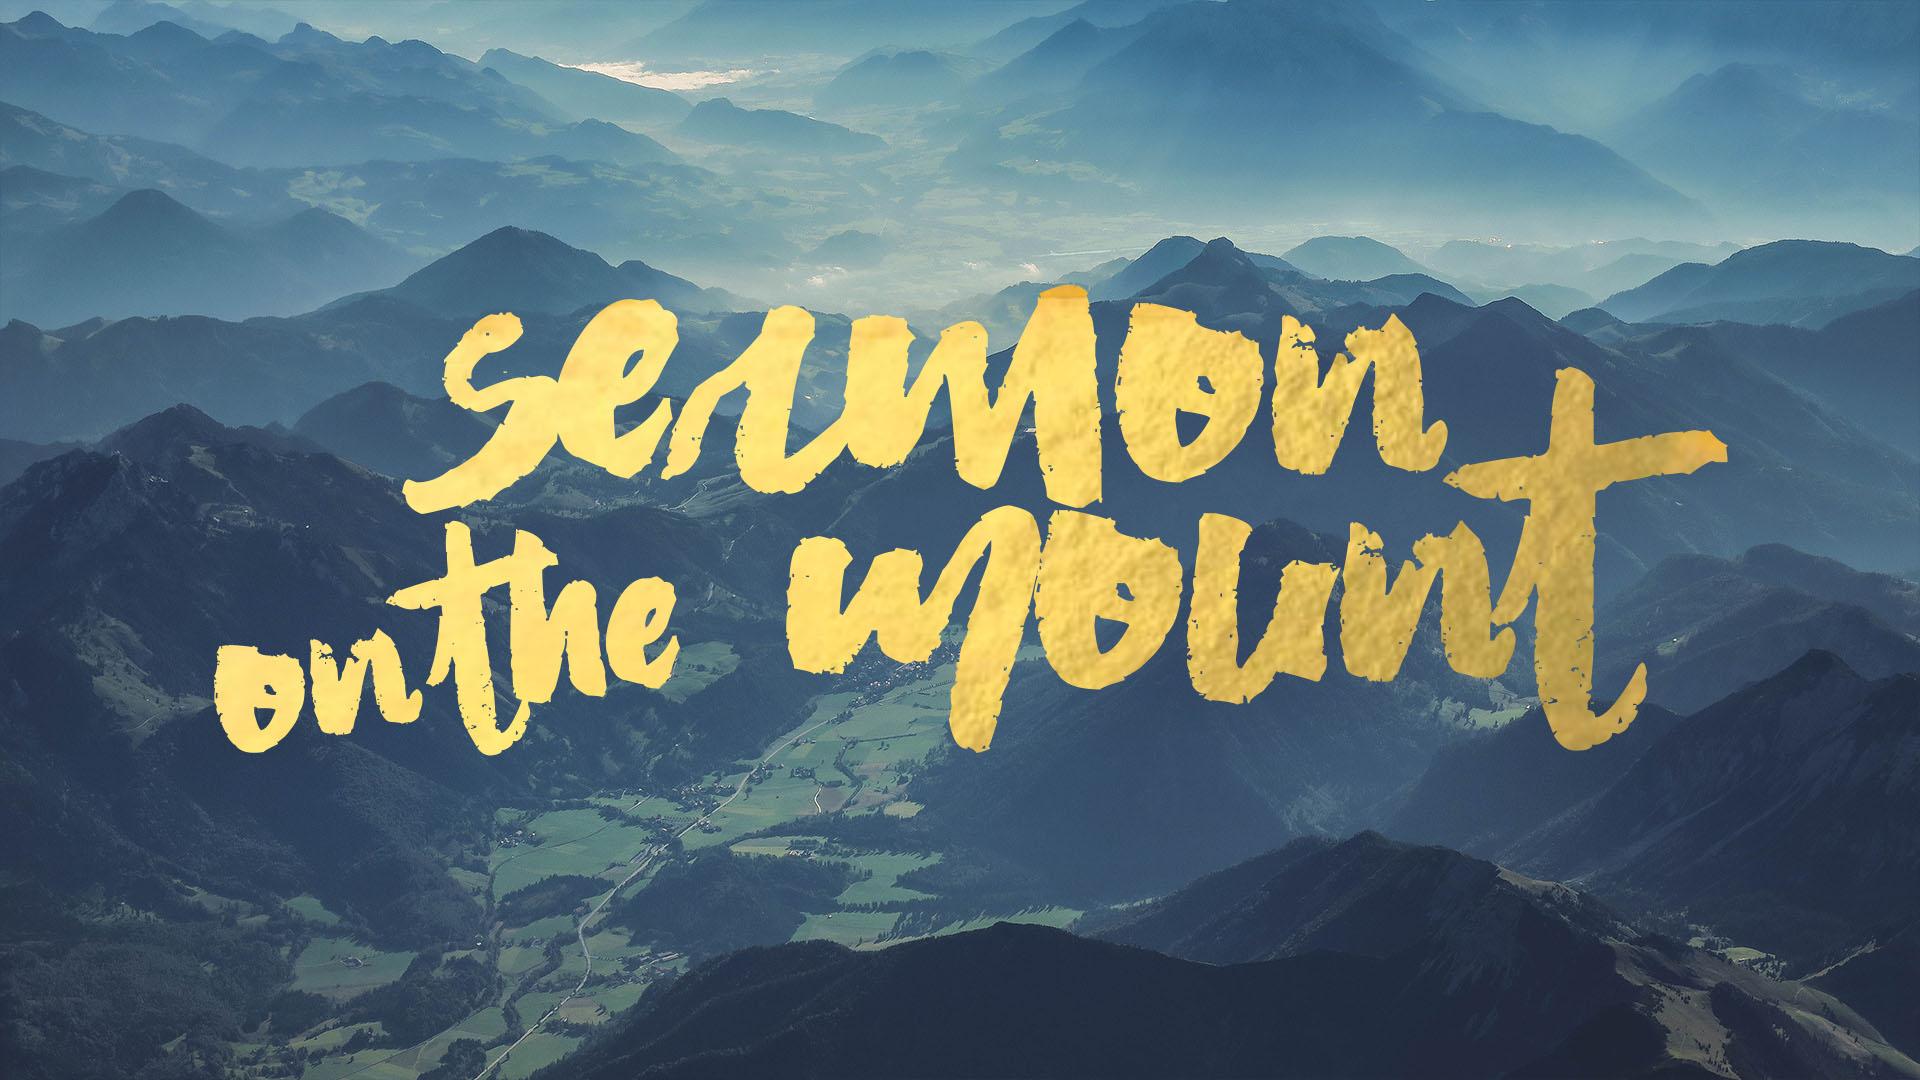 SermonOnTheMount